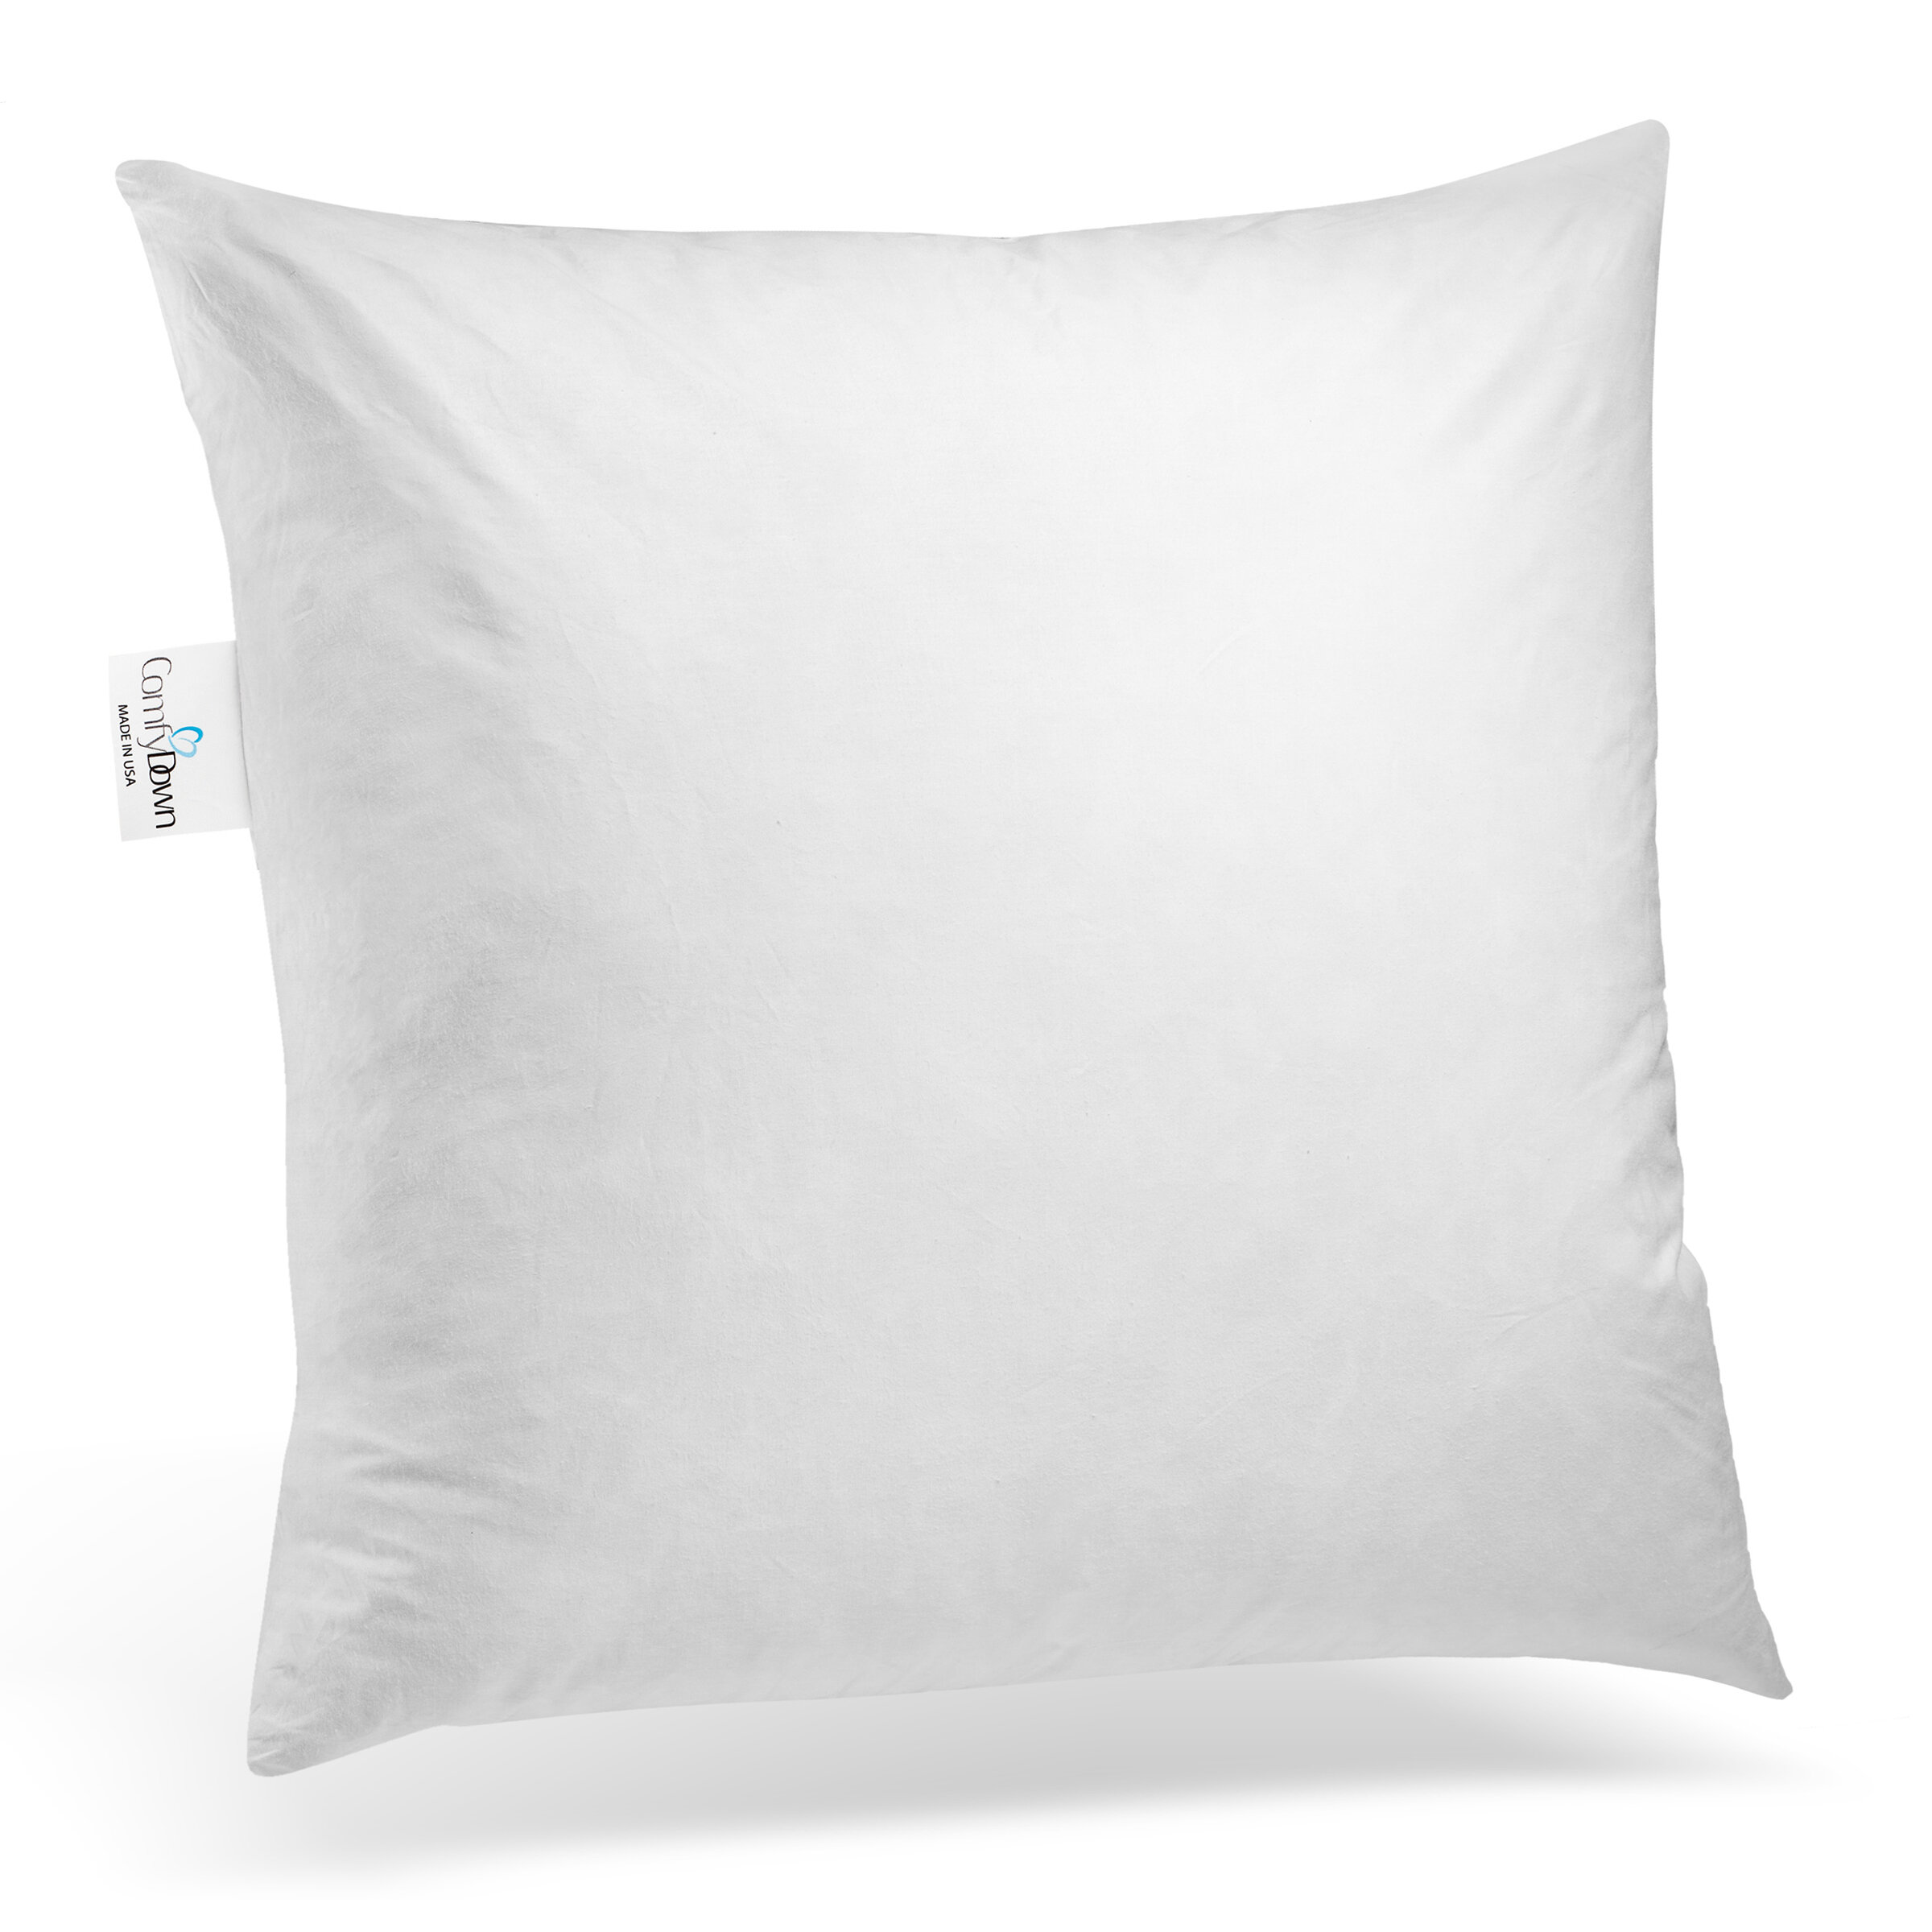 Oversized Throw Pillows You'll Love in 2019 | Wayfair